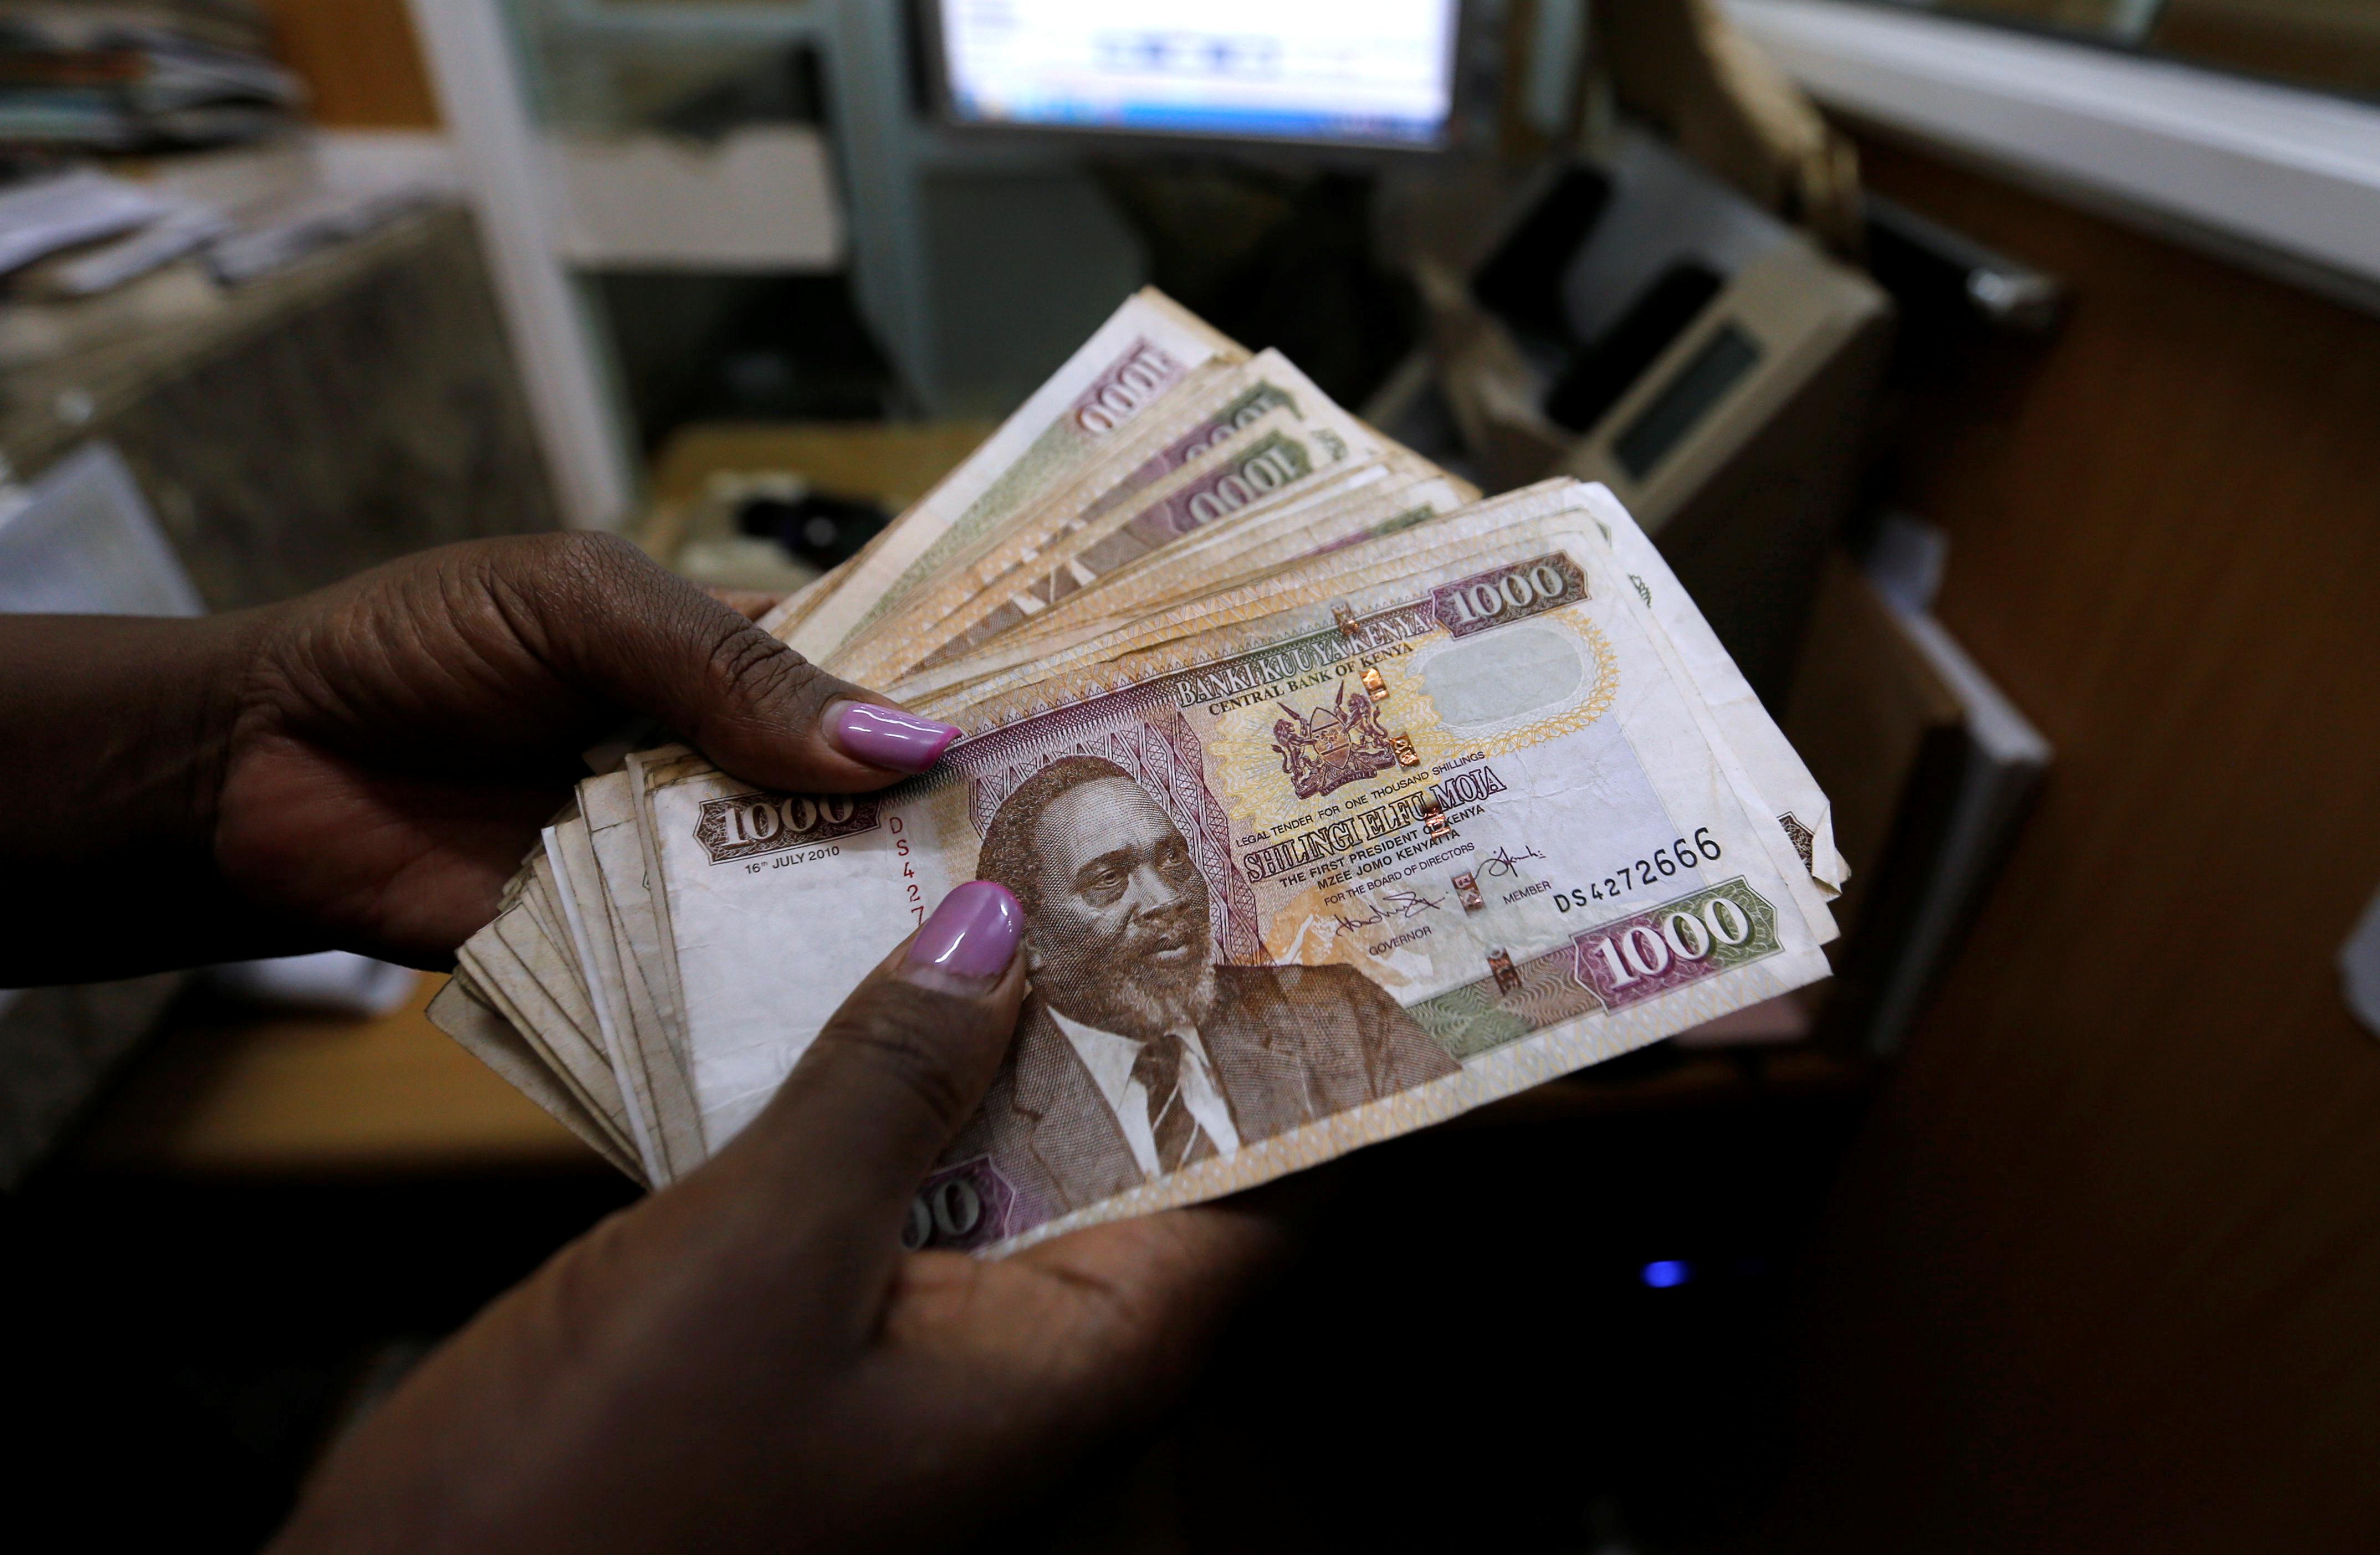 A teller counts Kenya shilling notes inside the cashier's booth at a forex exchange bureau in Kenya's capital Nairobi, April 20, 2016. REUTERS/Thomas Mukoya